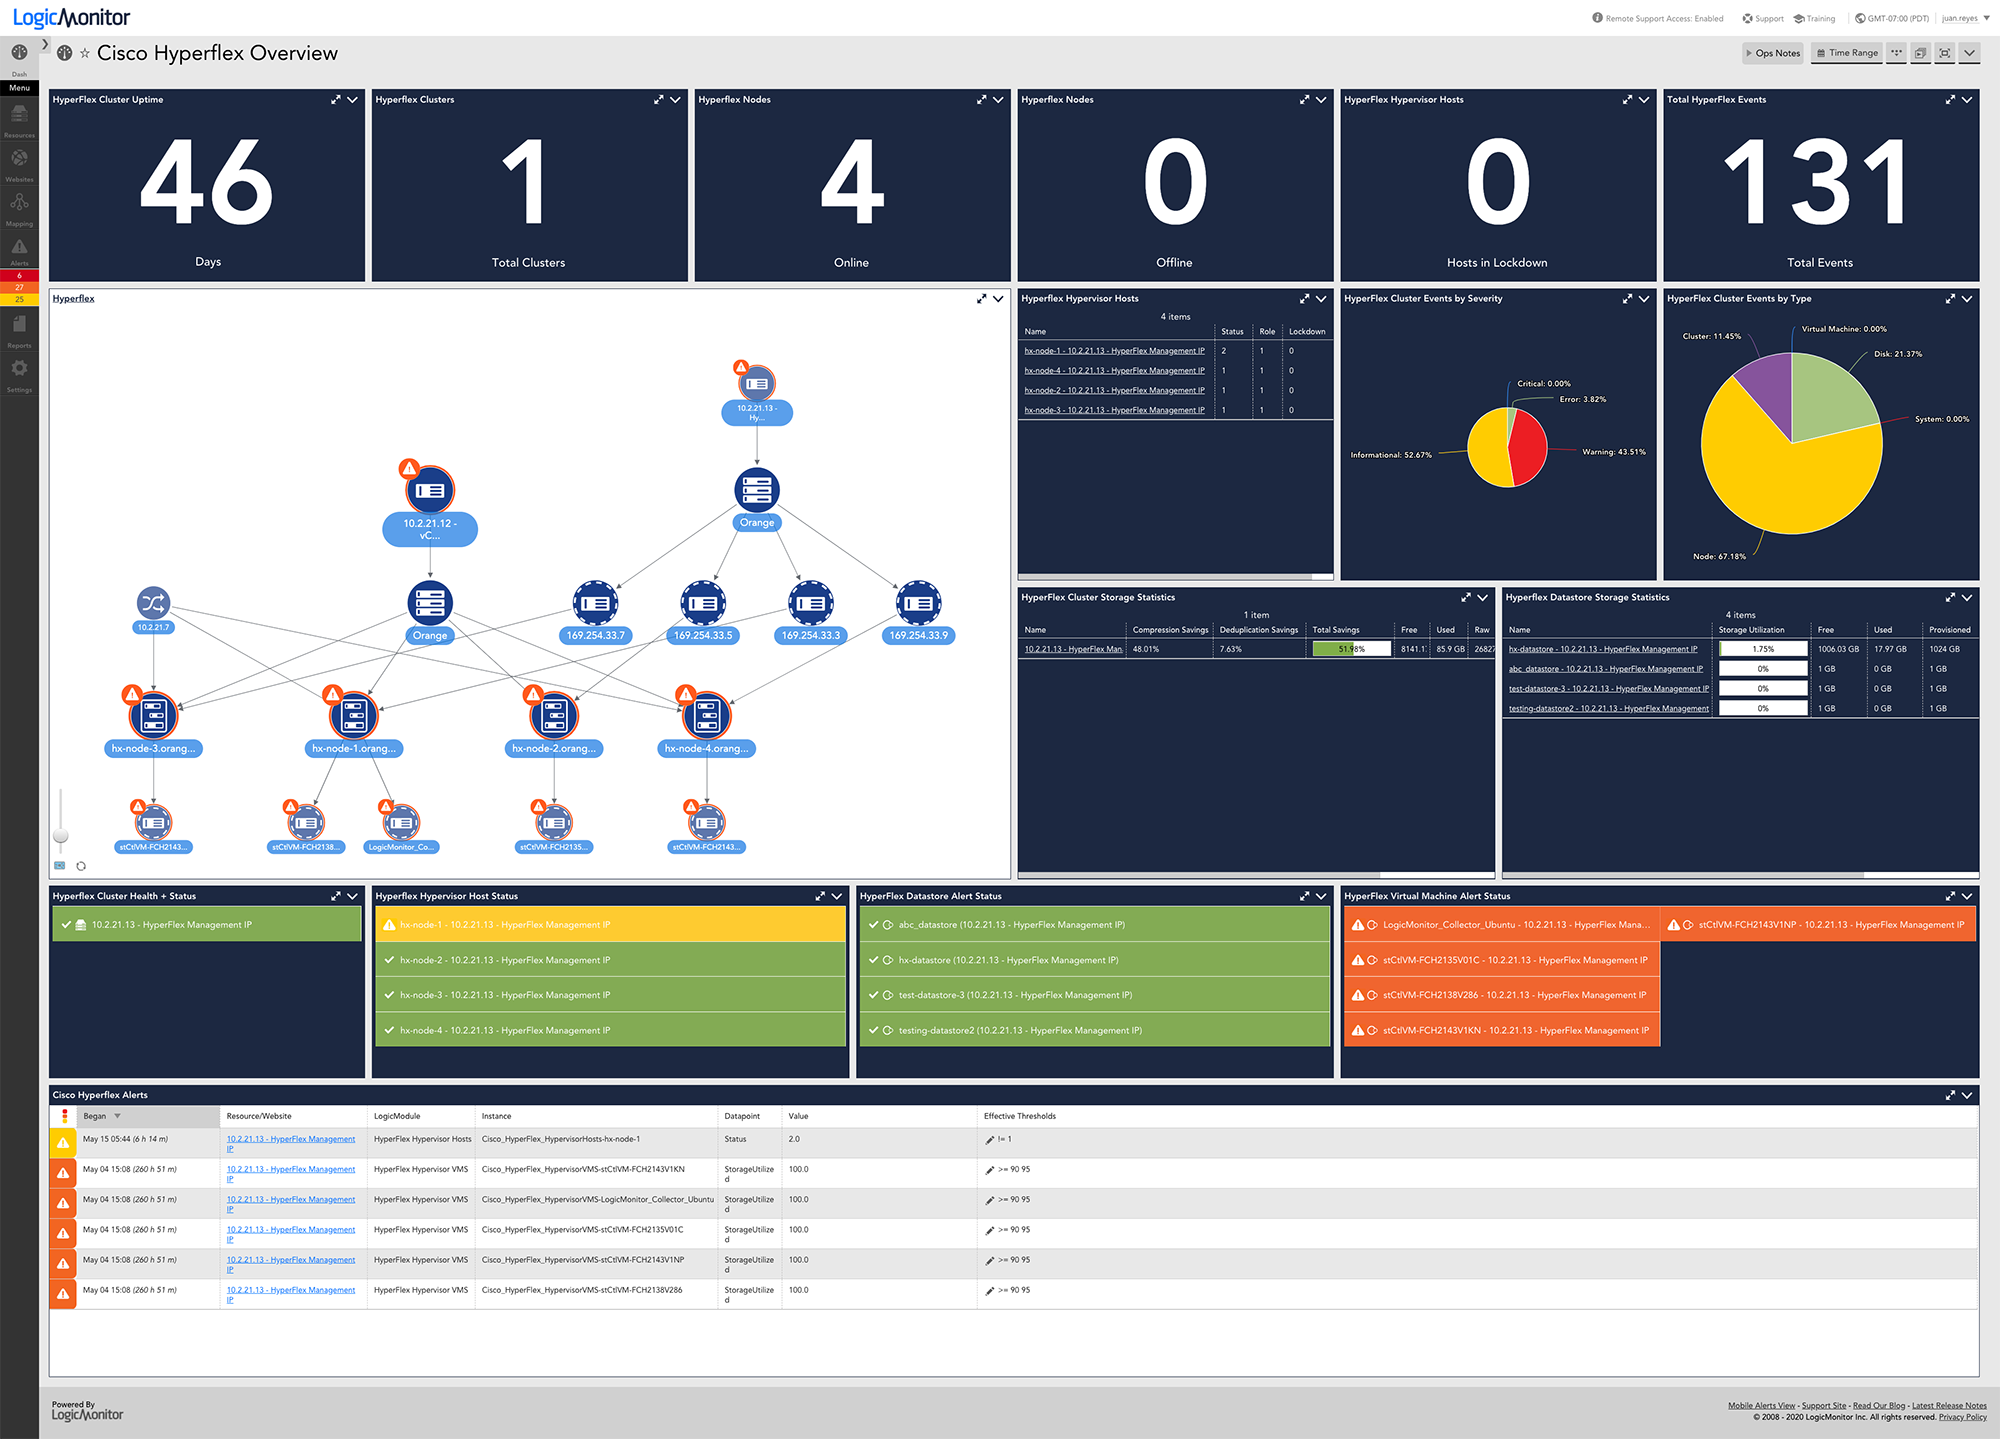 Cisco Overview Dashboard